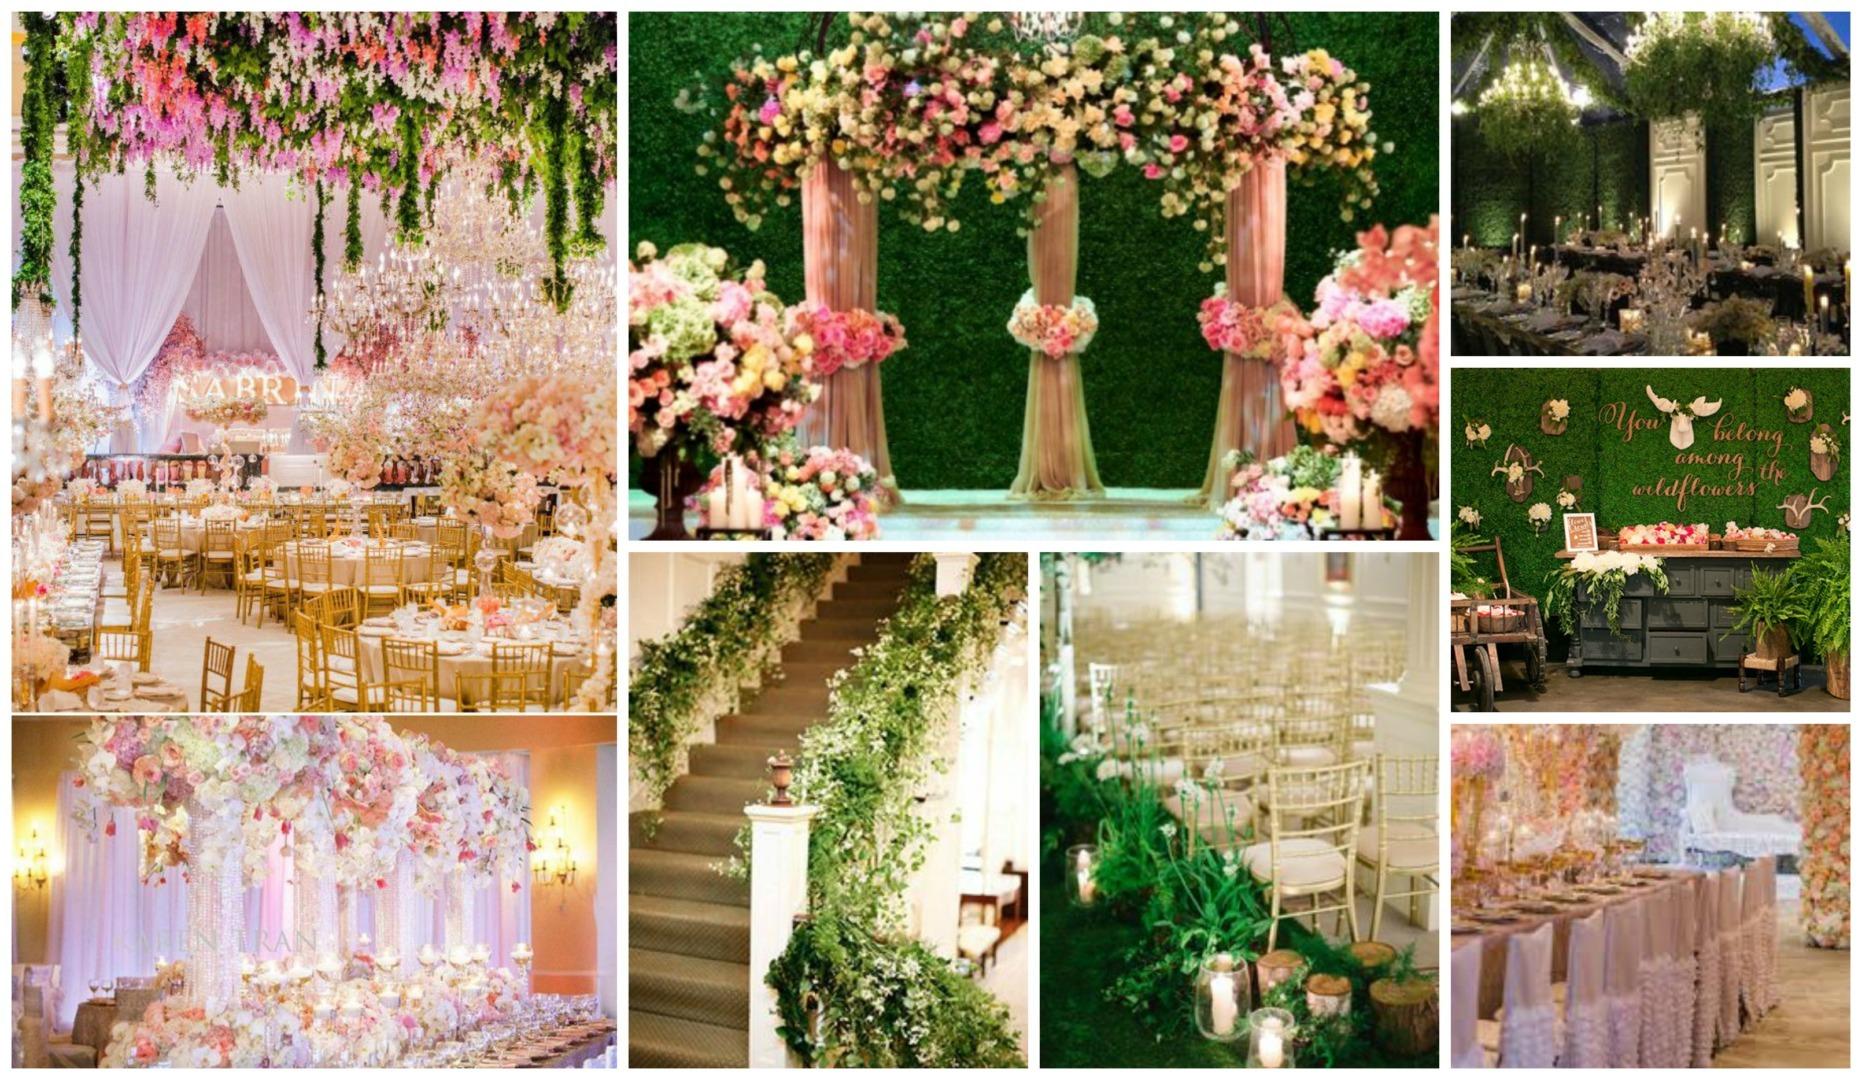 Unforgettable Garden Wedding Decor: Bring The Outside In